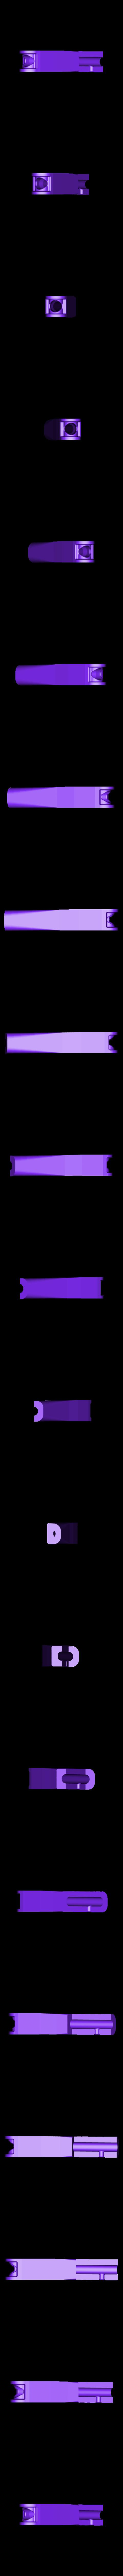 arm front2 (1pcs).STL Download STL file Folding Quadcopter 450 Frame • 3D print object, AleksandrDolzhenko